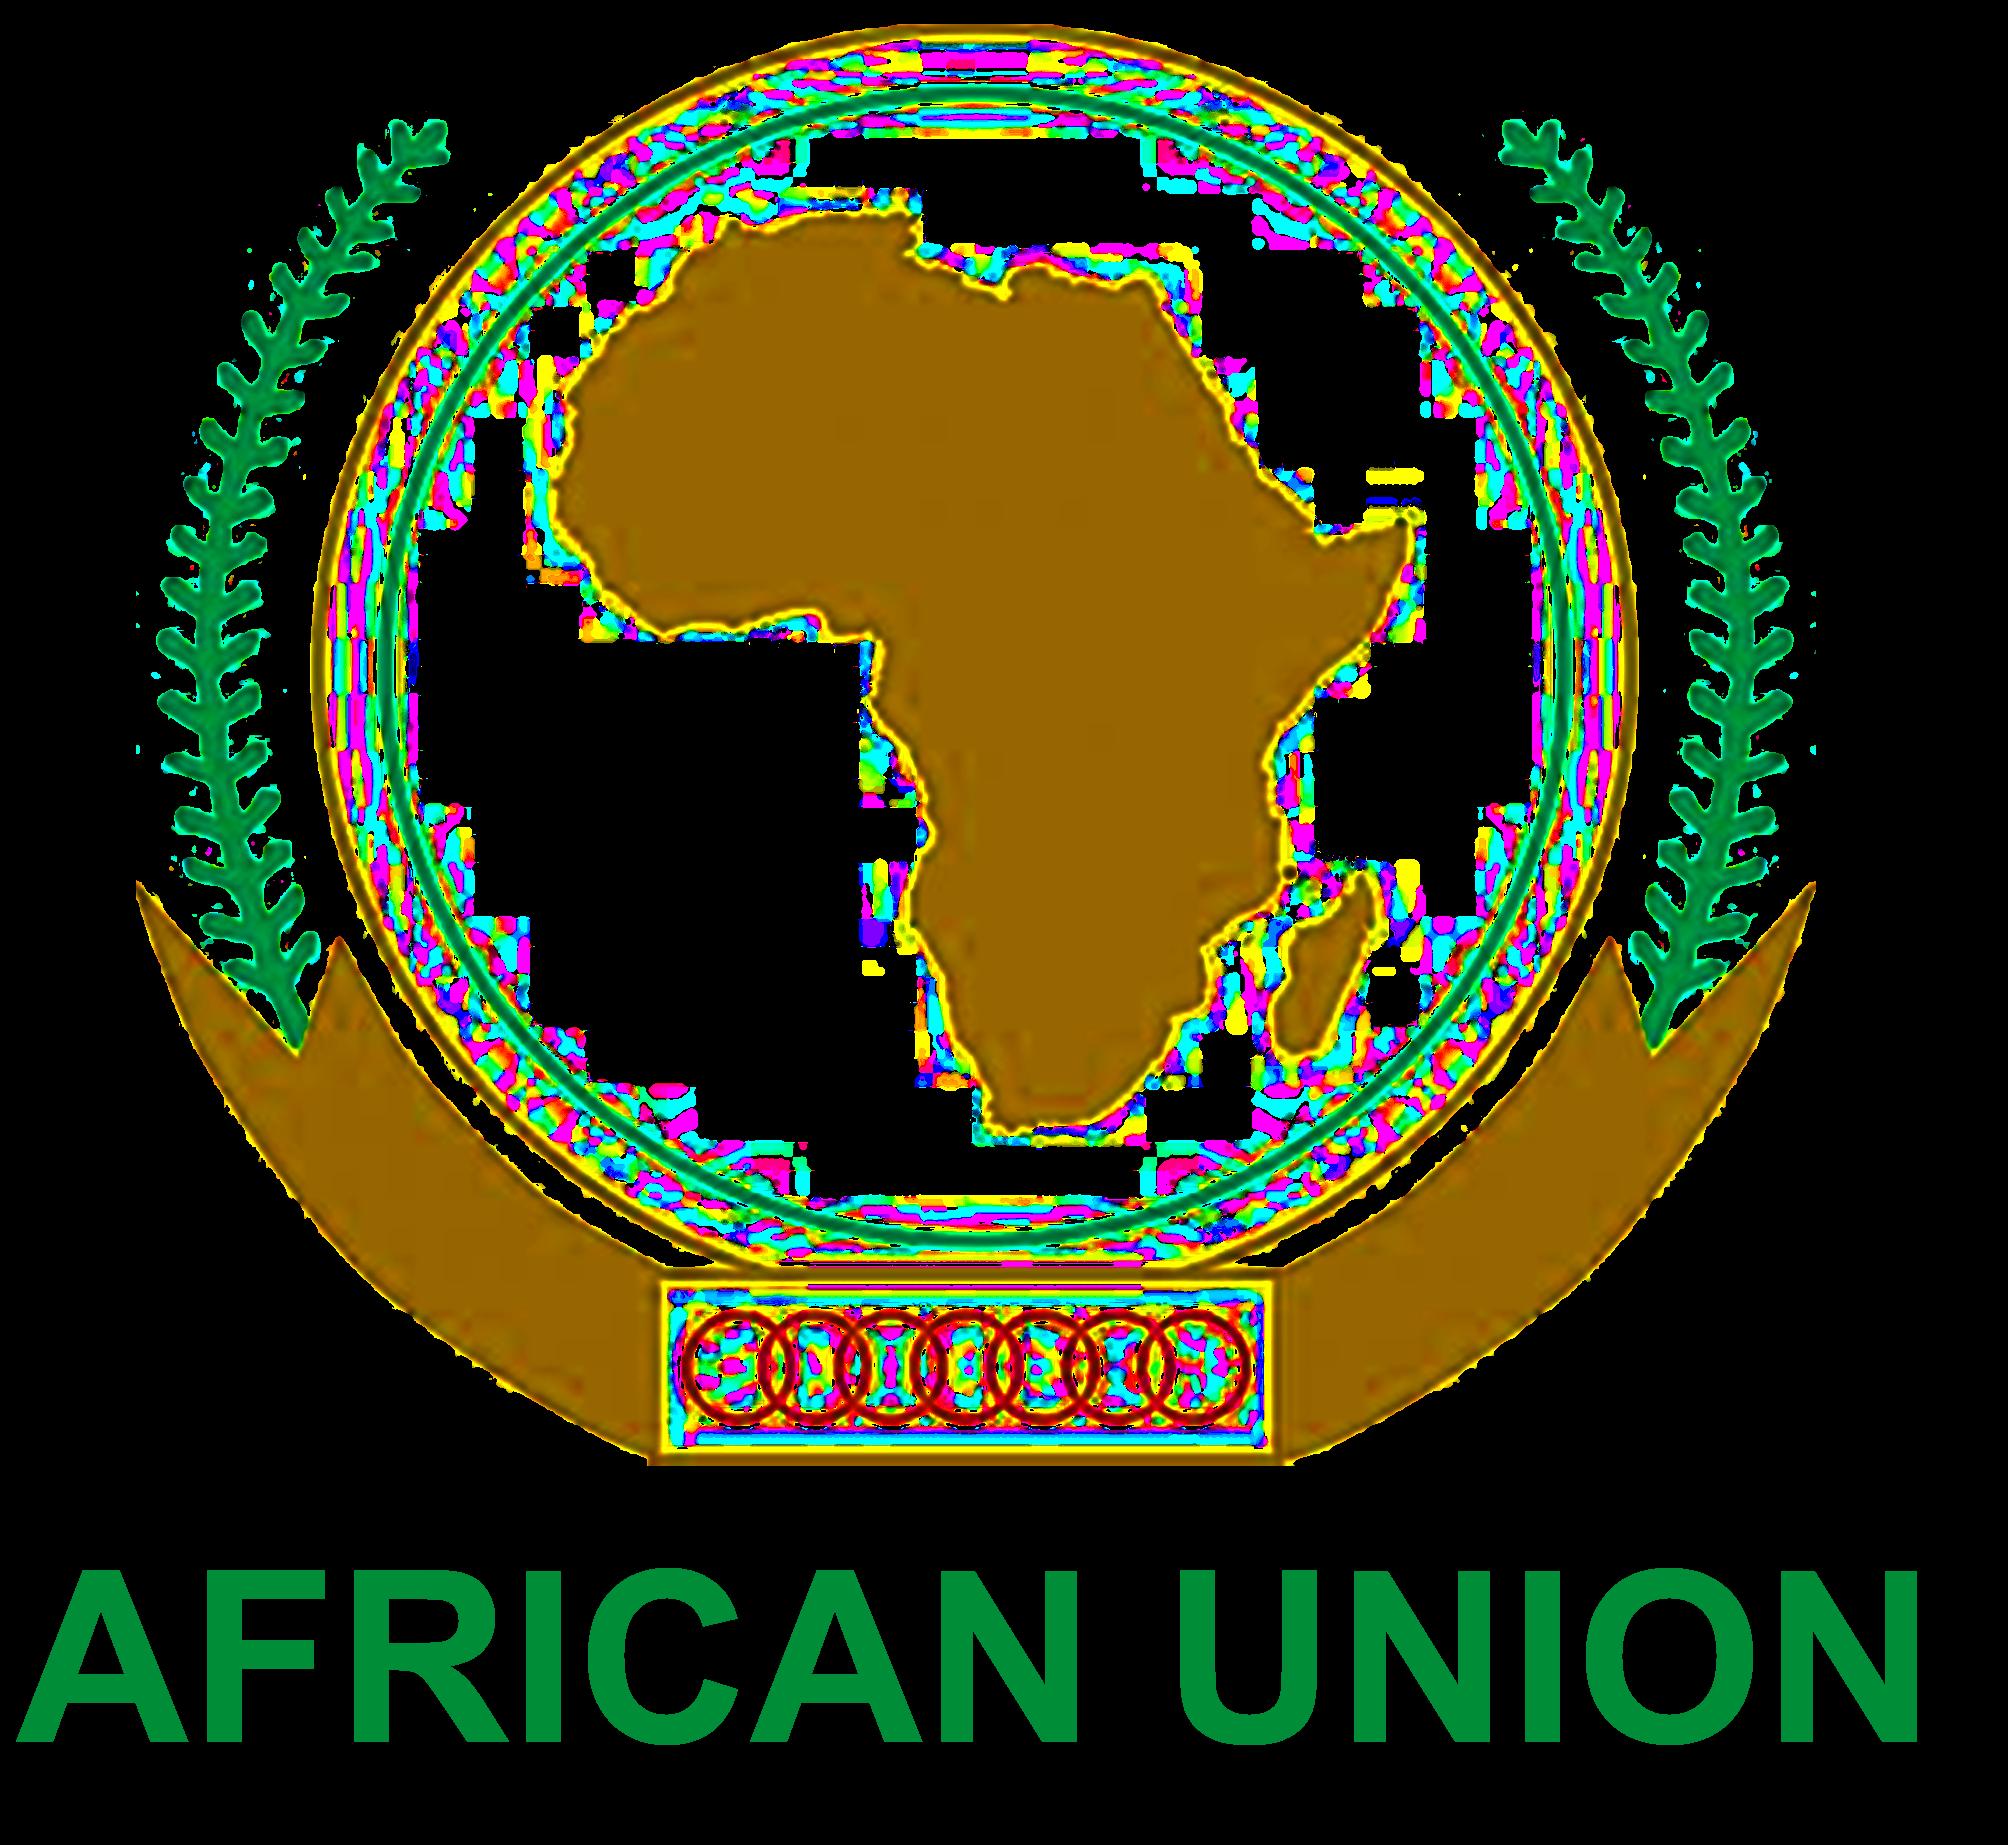 african-union-logo